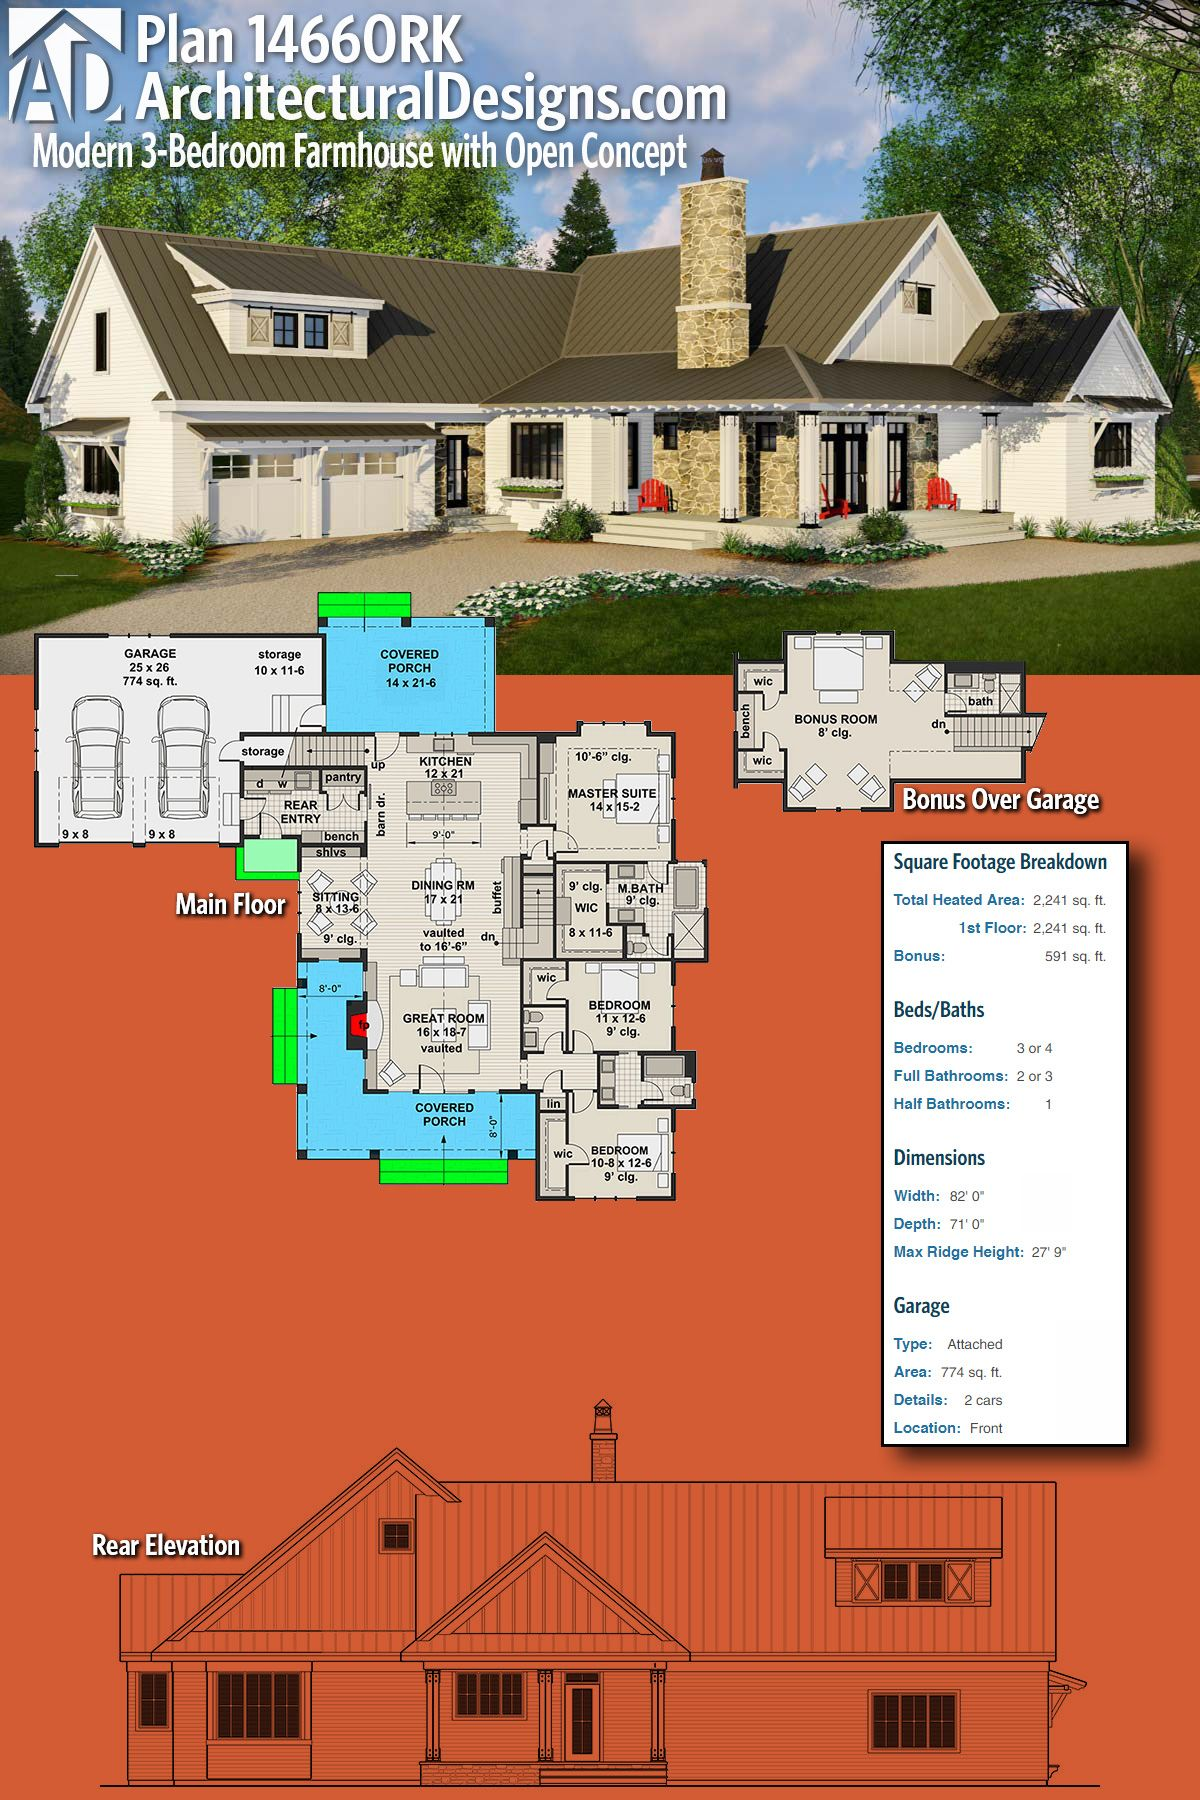 Architectural Designs Modern Farmhouse Plan 14460RK gives